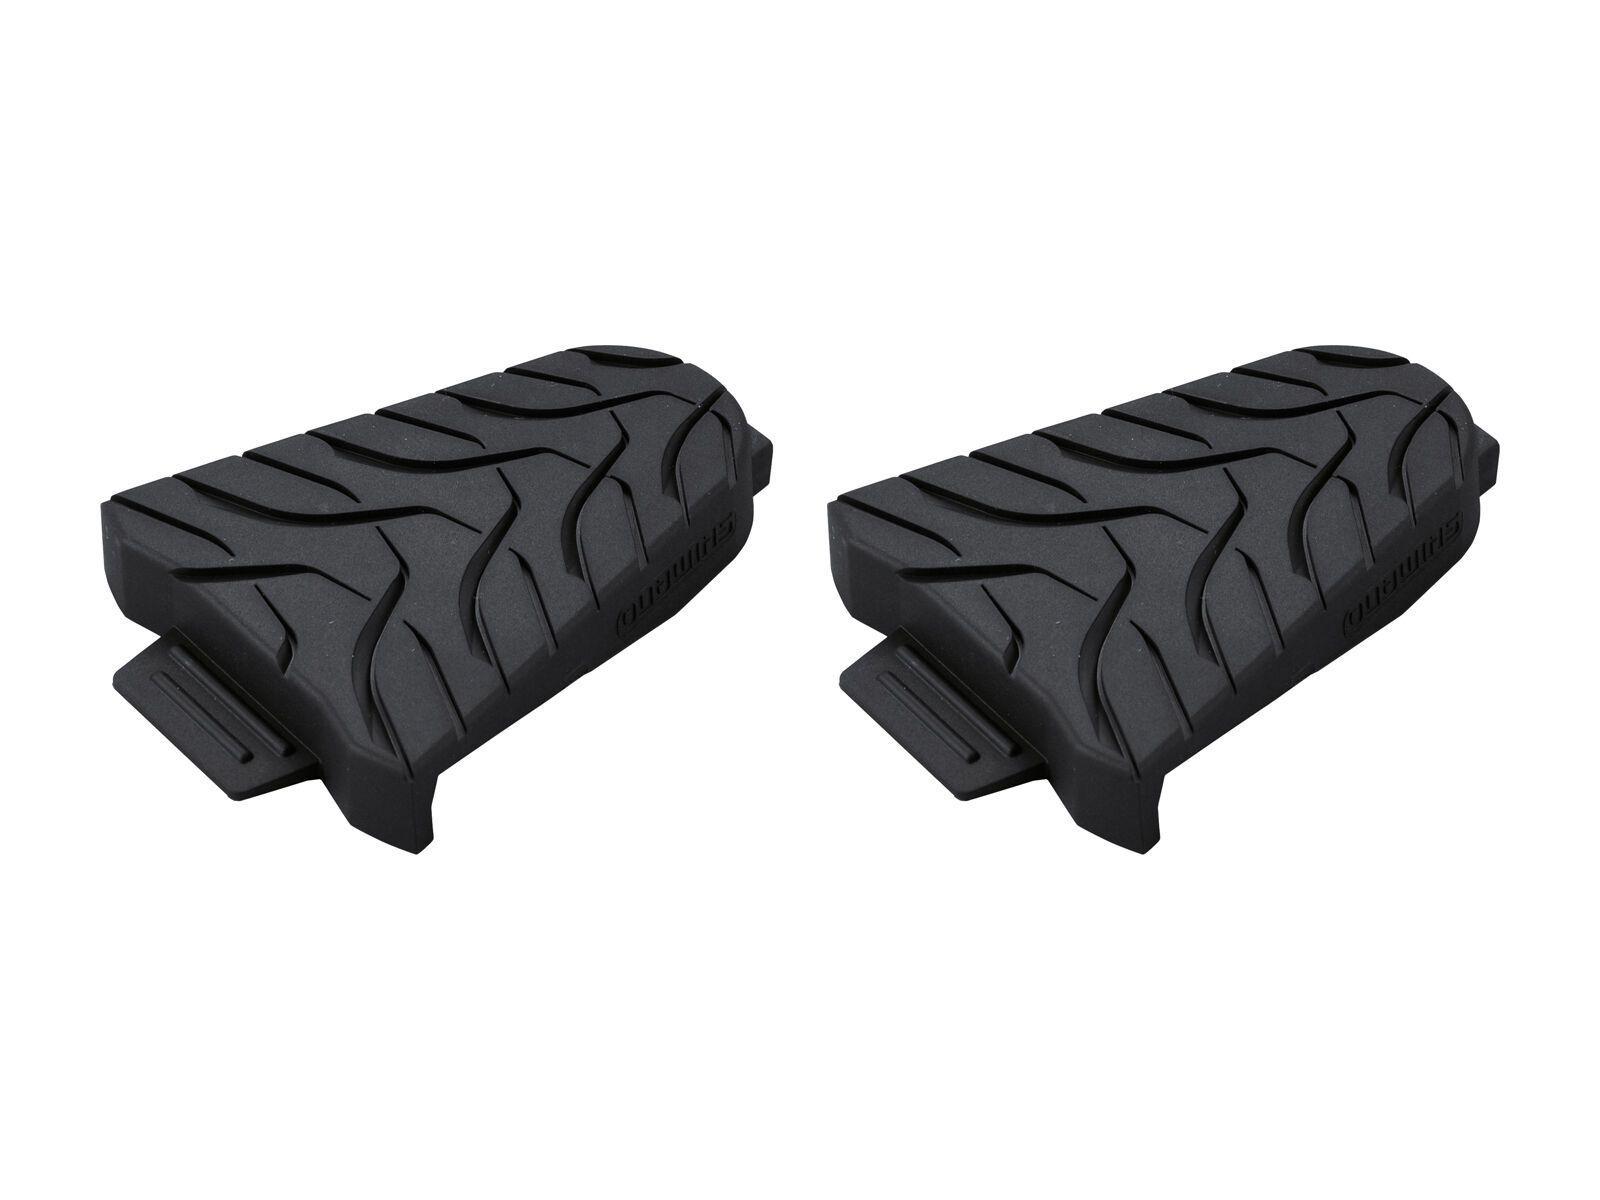 Shimano SM-SH45 Cleat Cover - Plattenschutz E-SMSH45